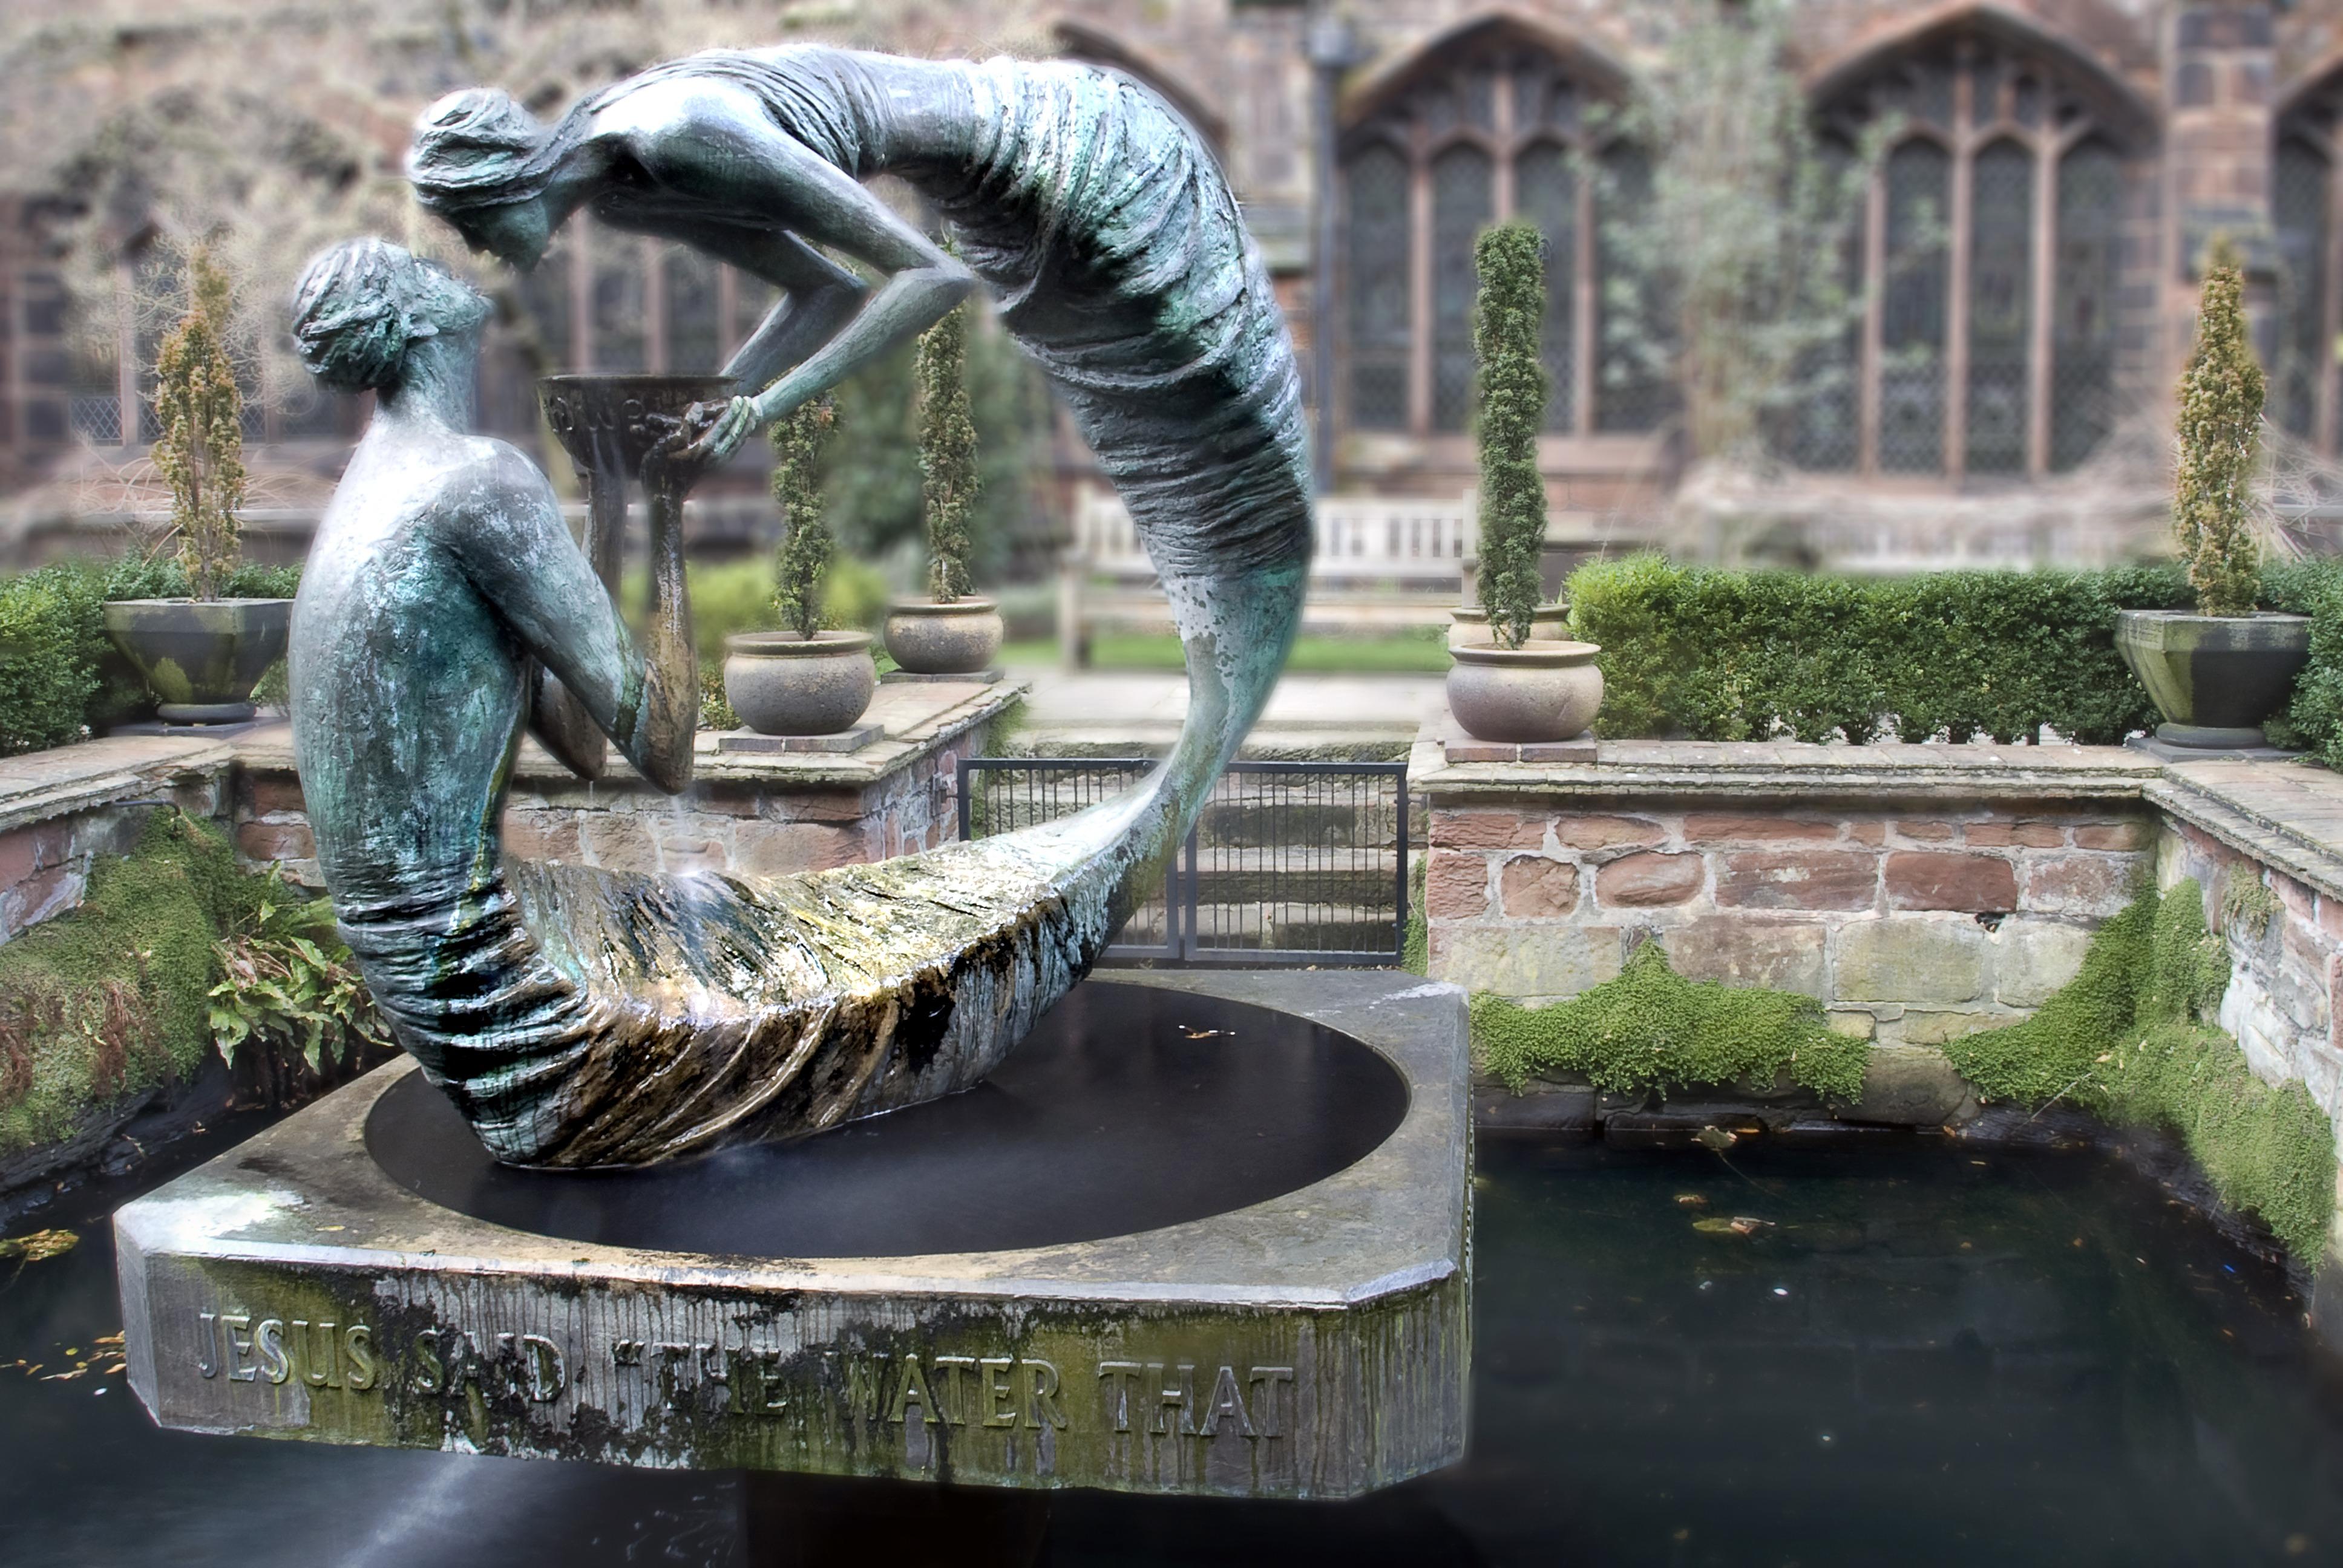 Creative Woman Monument Statue Love Zoo Construction Metal Metal Work Garden  Artwork Sculpture Art Figure Creativity